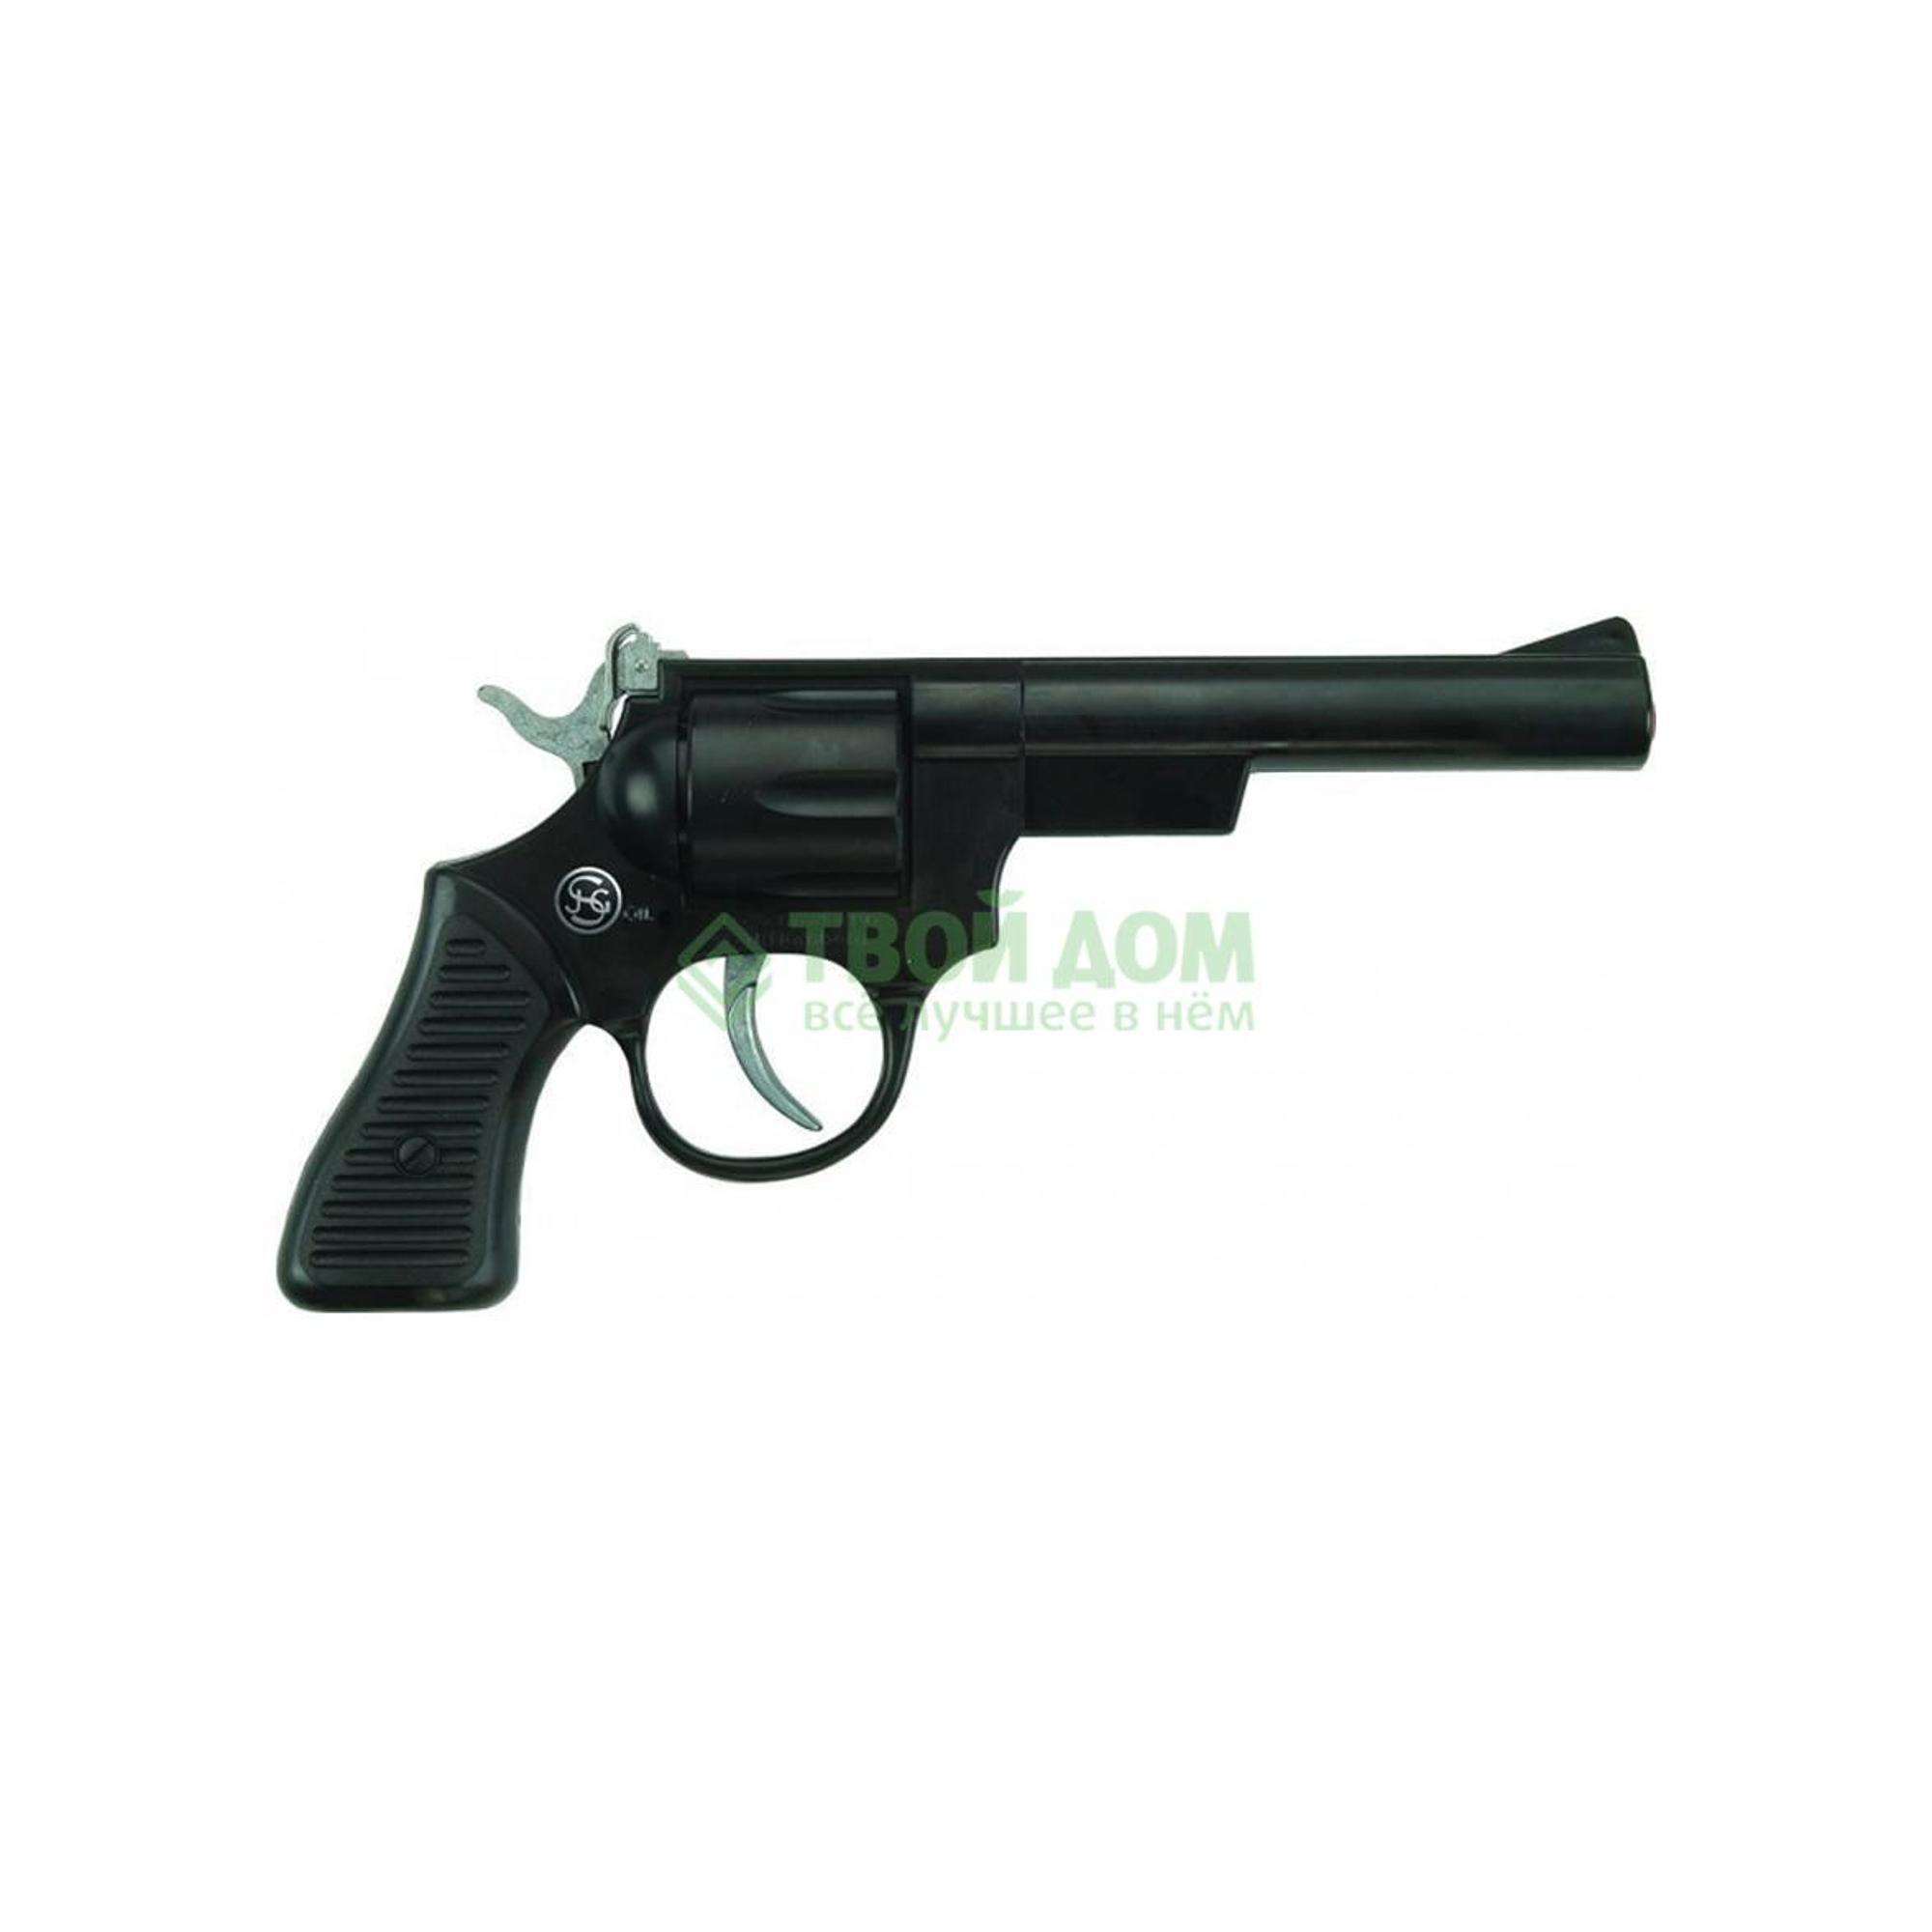 Пистолет Schrodel and Ideal 4019151 Junior 200 фото